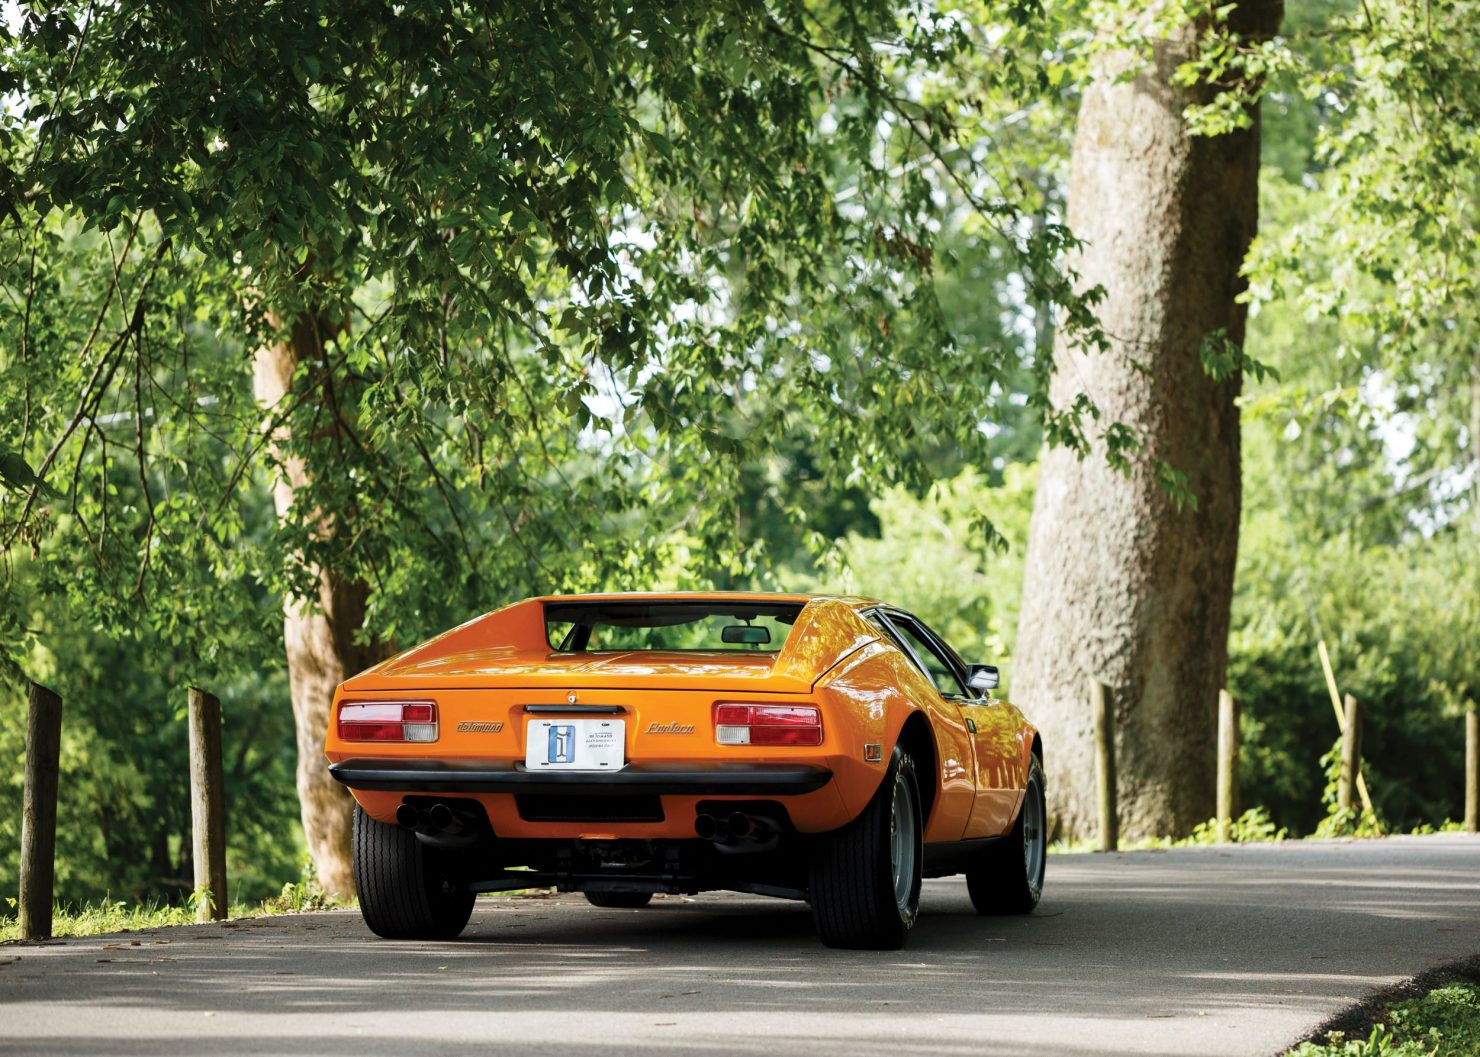 de tomaso pantera 21 1480x1057 - The Last American De Tomaso Pantera